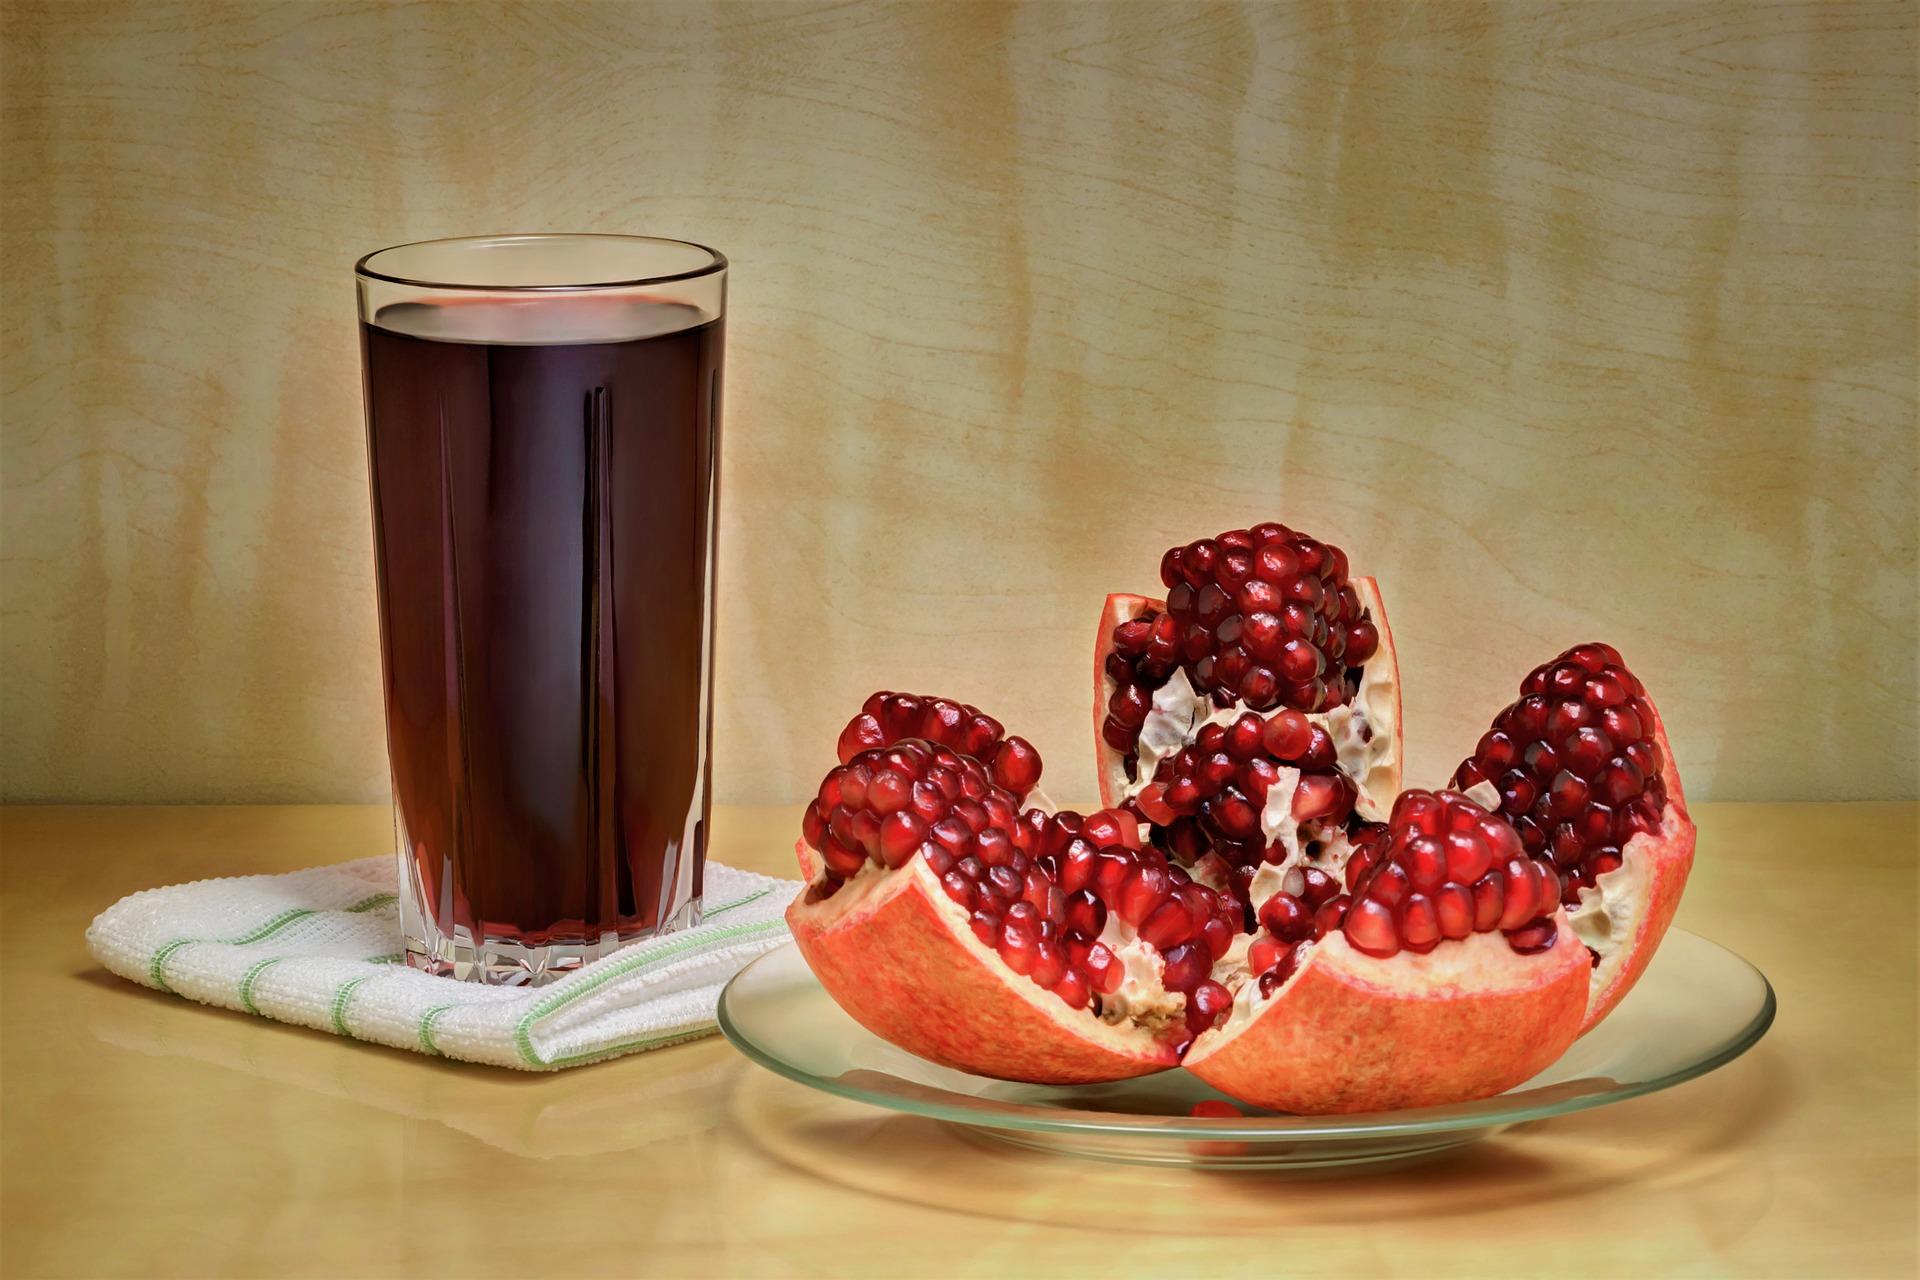 pomegranate 3977500 1920